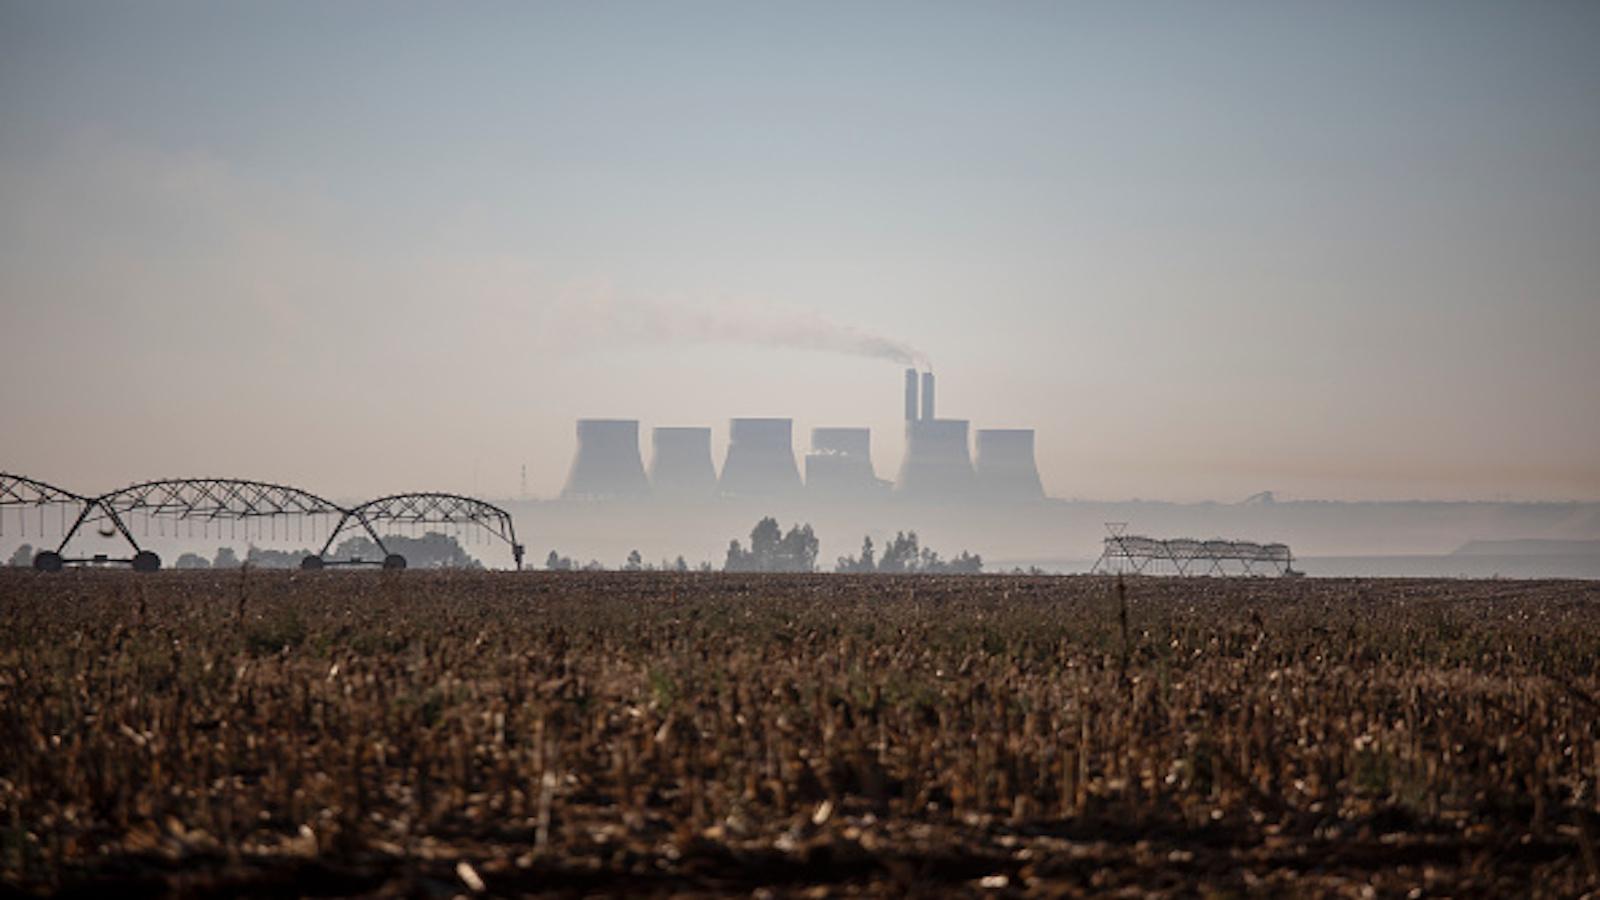 eMalahleni South Africa power plant